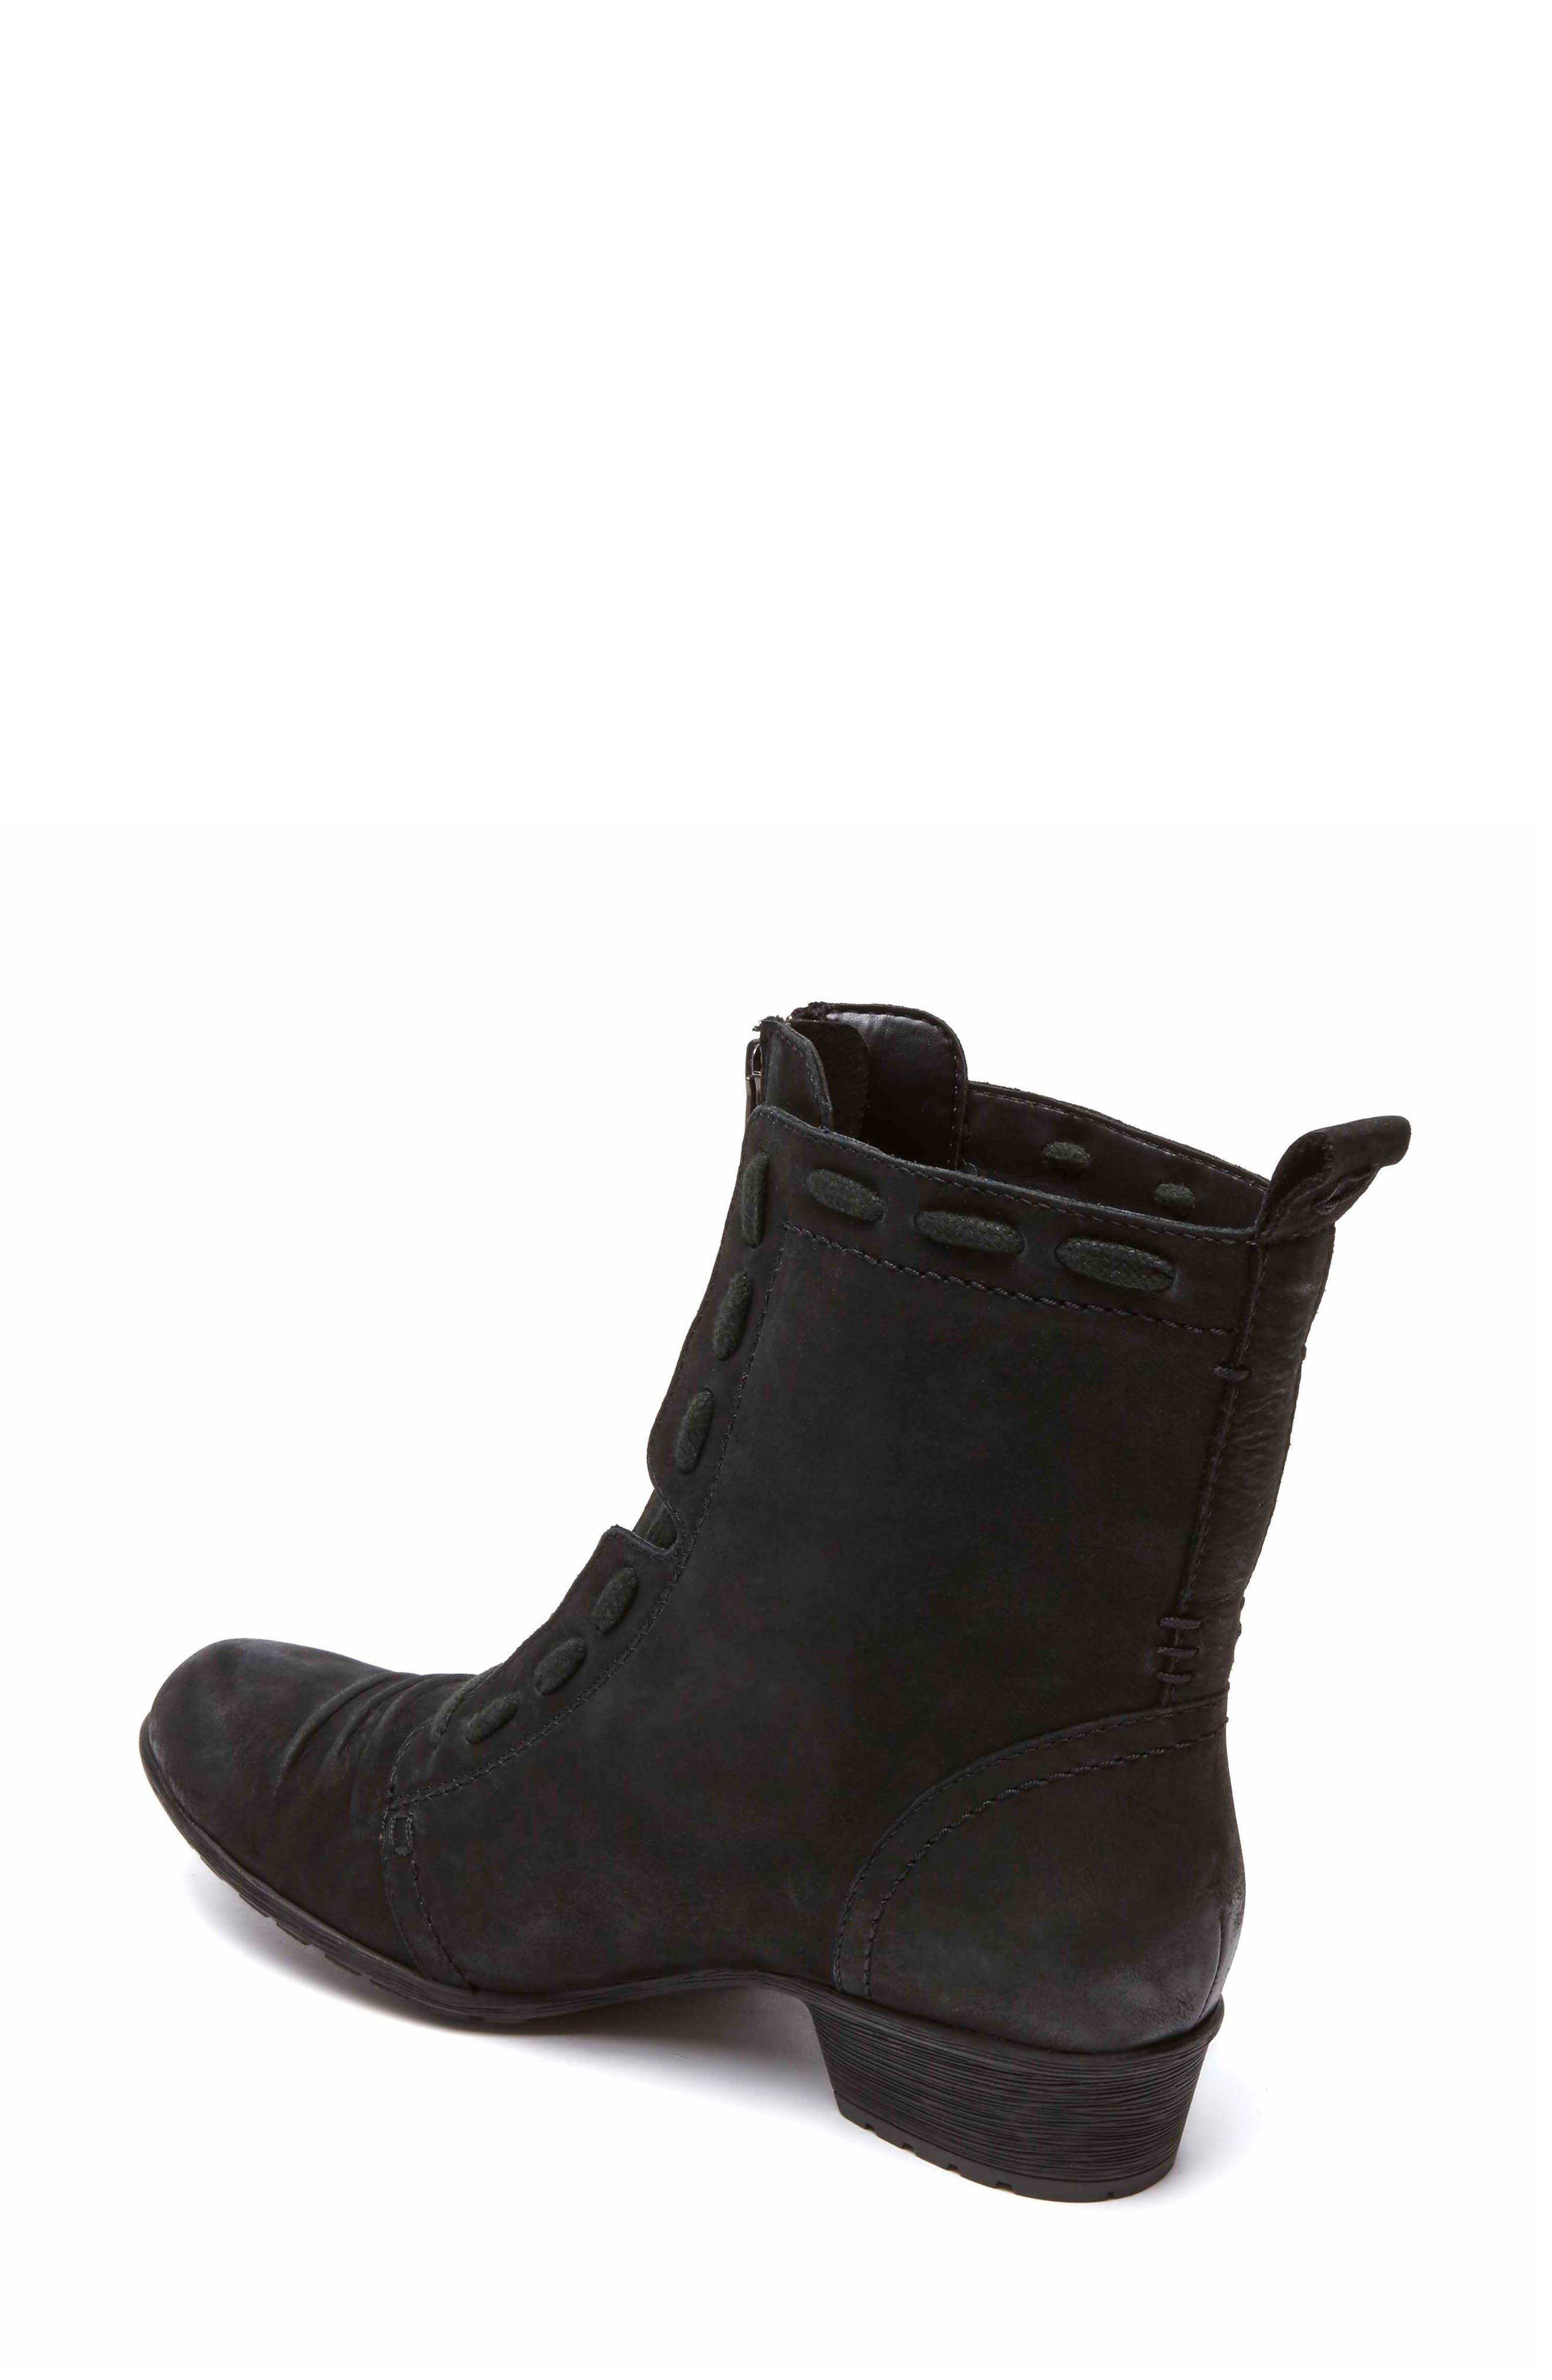 Gratasha Front Zip Boot,                             Alternate thumbnail 2, color,                             BLACK NUBUCK